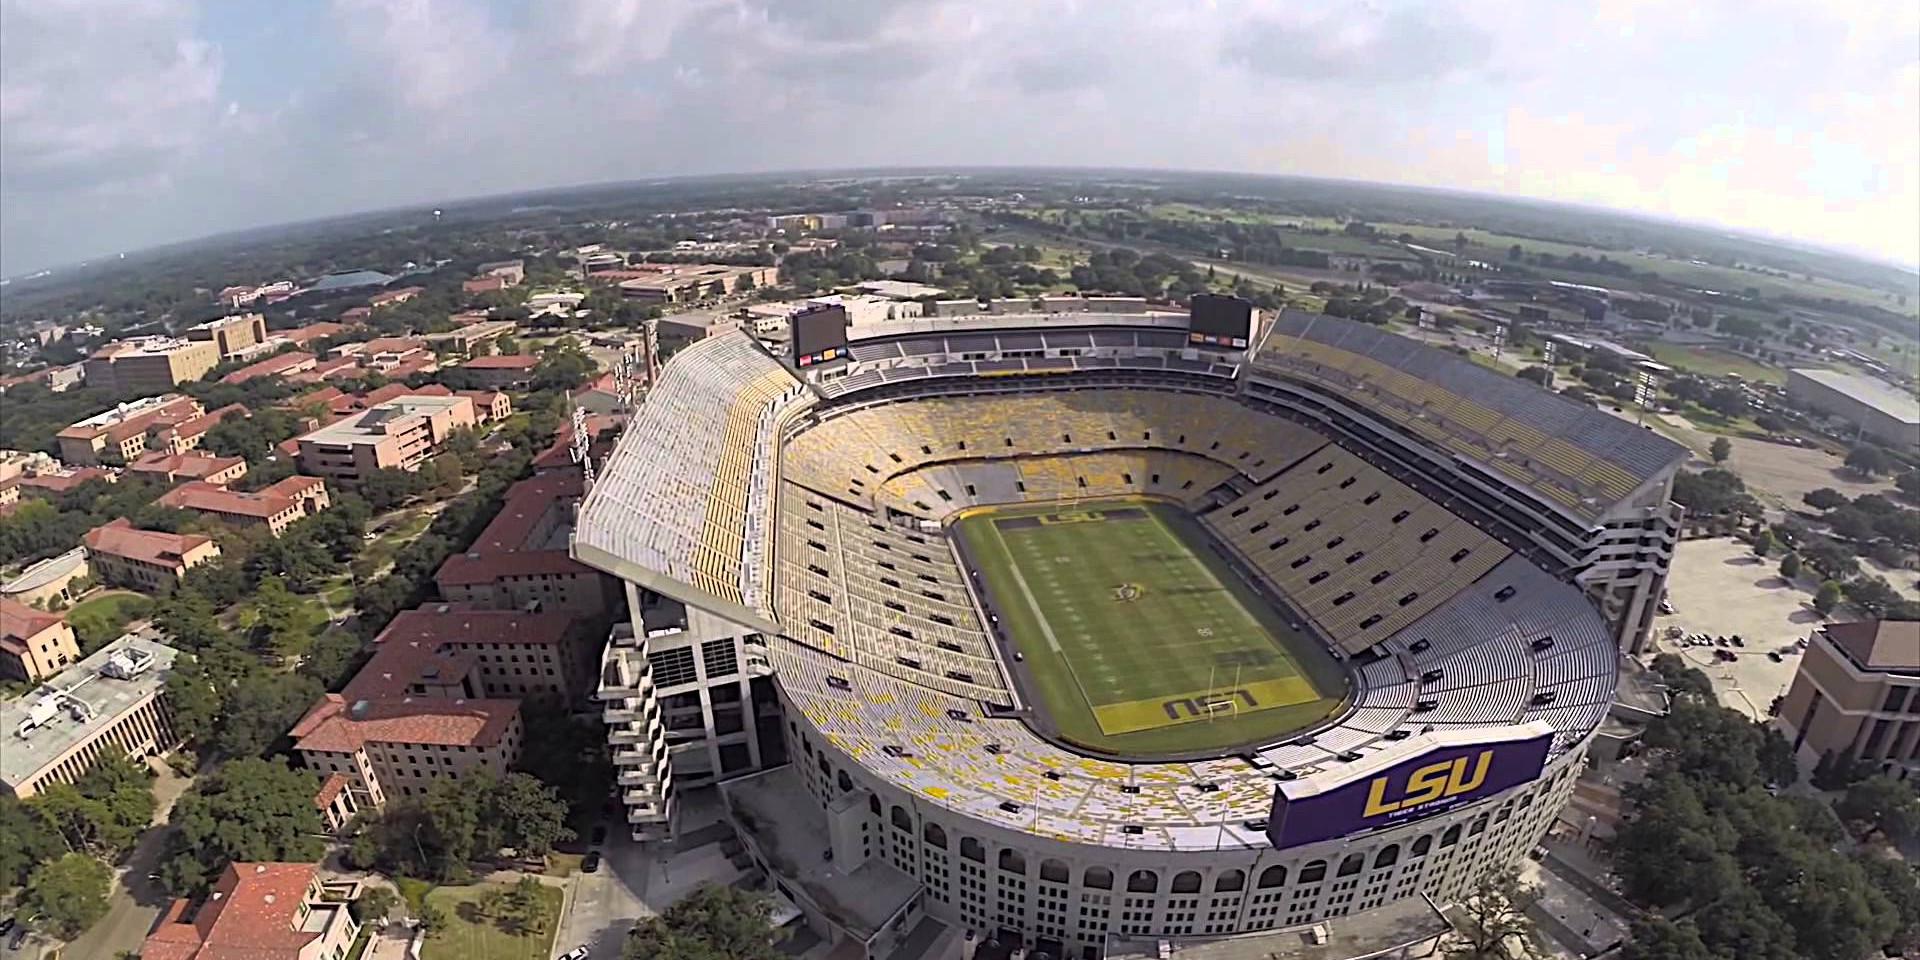 LSU Tiger Stadium - Baton Rouge, LA